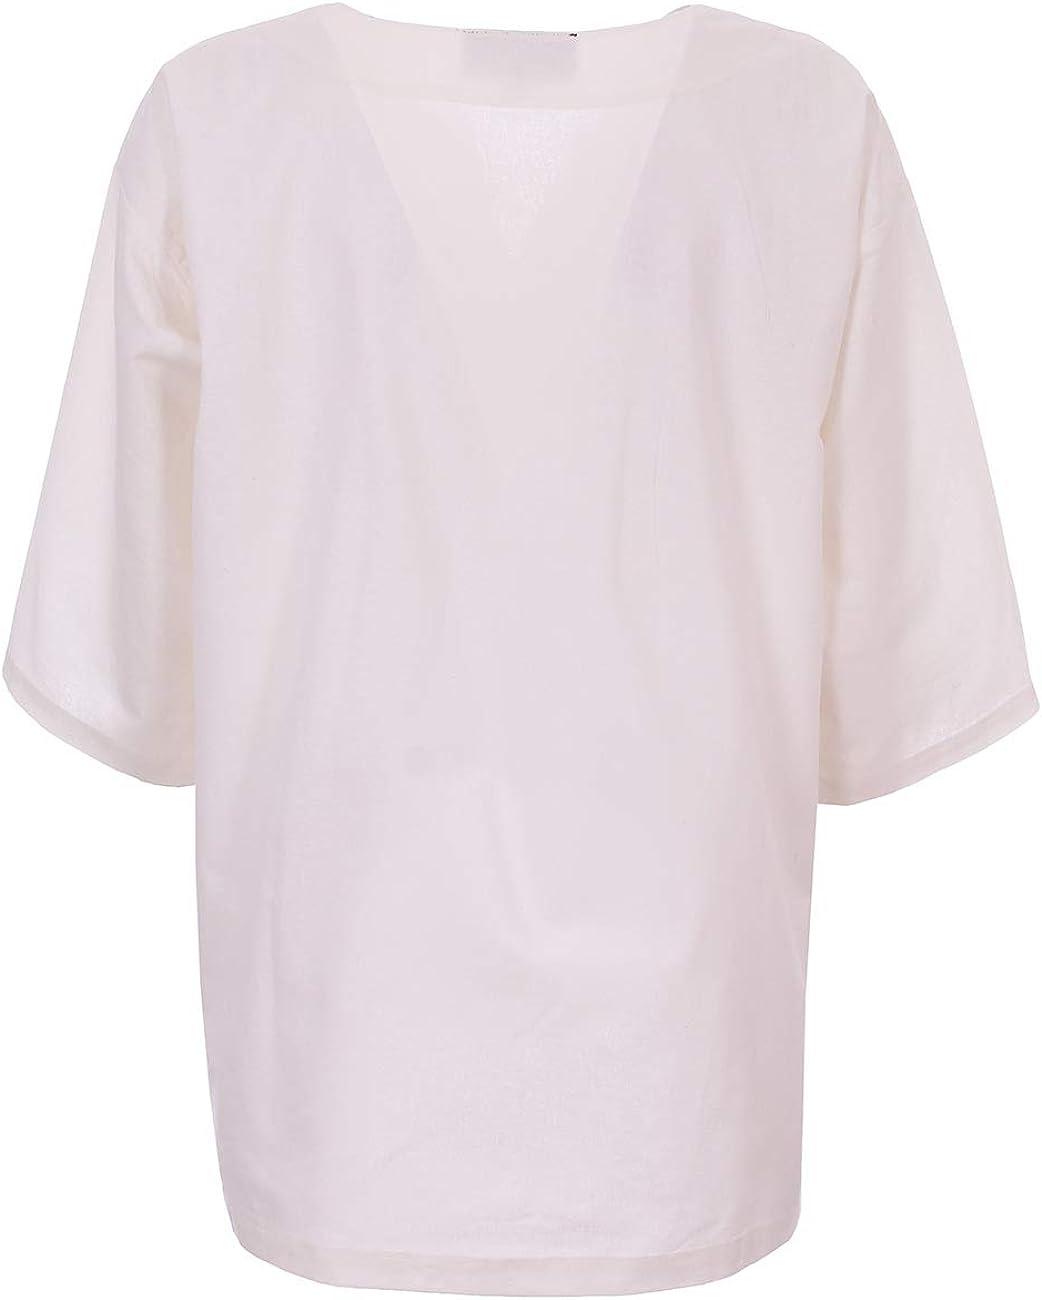 JapanAttitude Camisa Blanca de Algodón Antigua Imperial GN ...